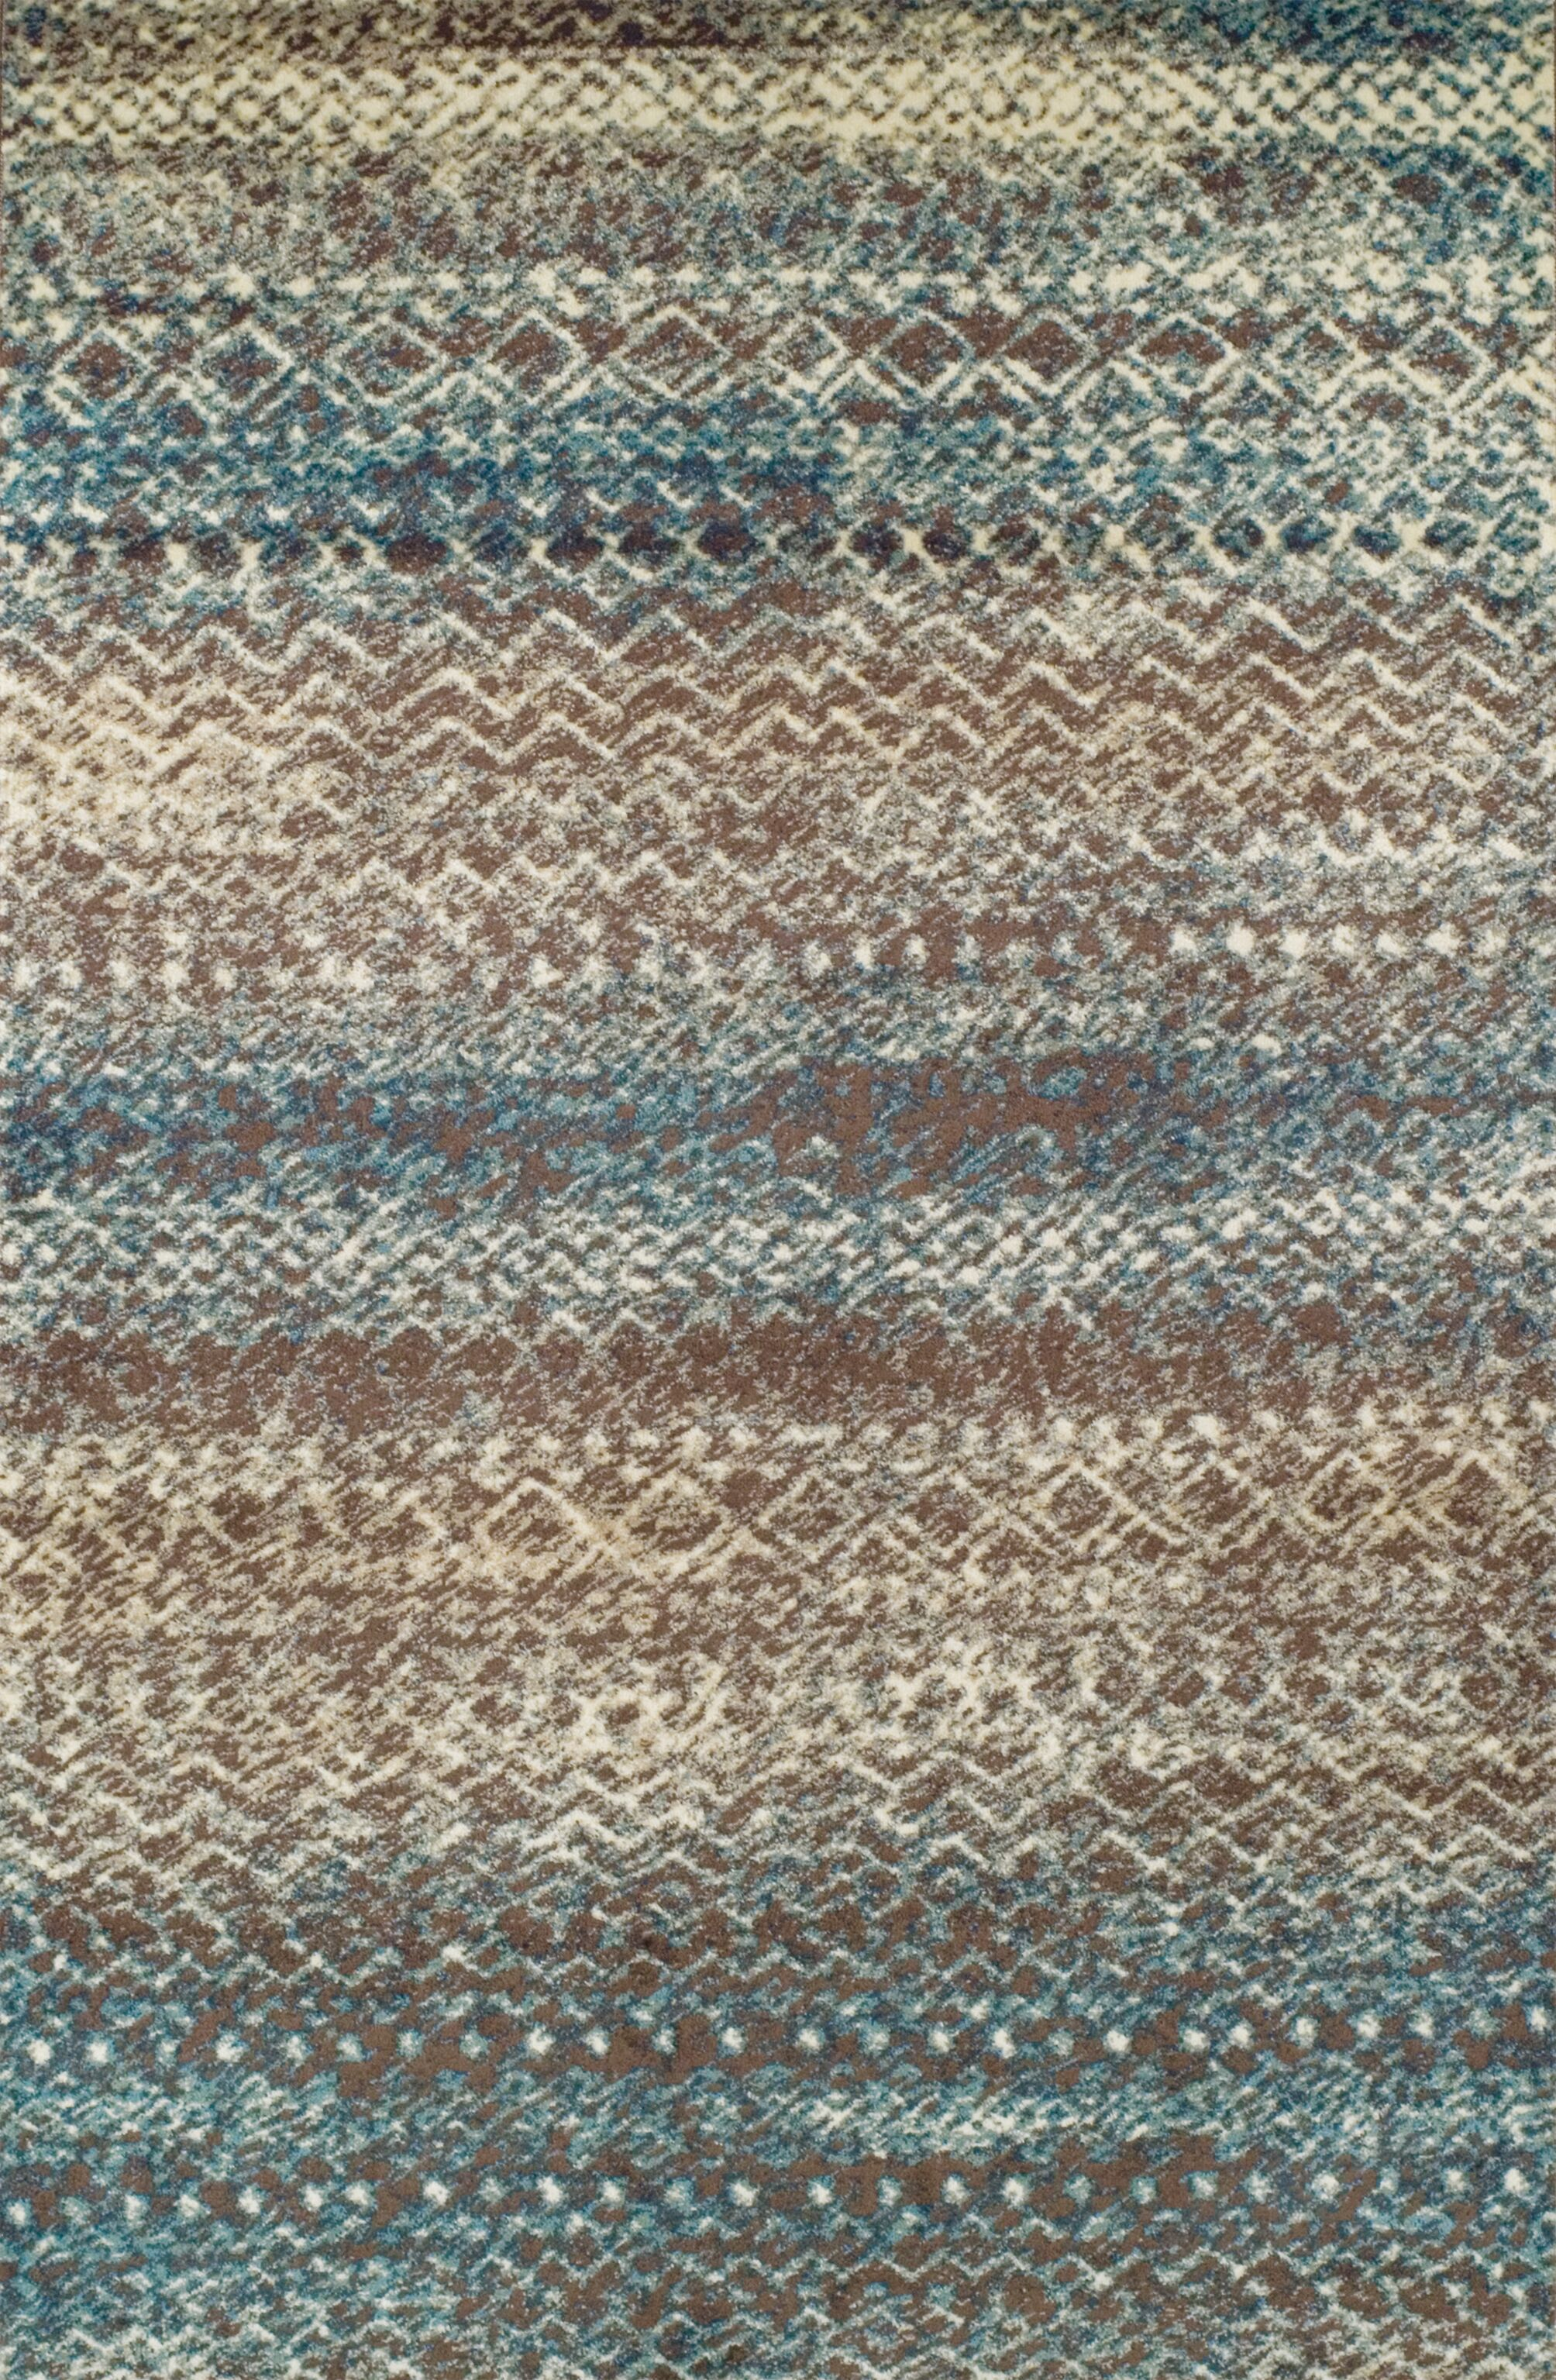 Hopkins Taupe/Ivory Area Rug Rug Size: Rectangle 5' x 8'